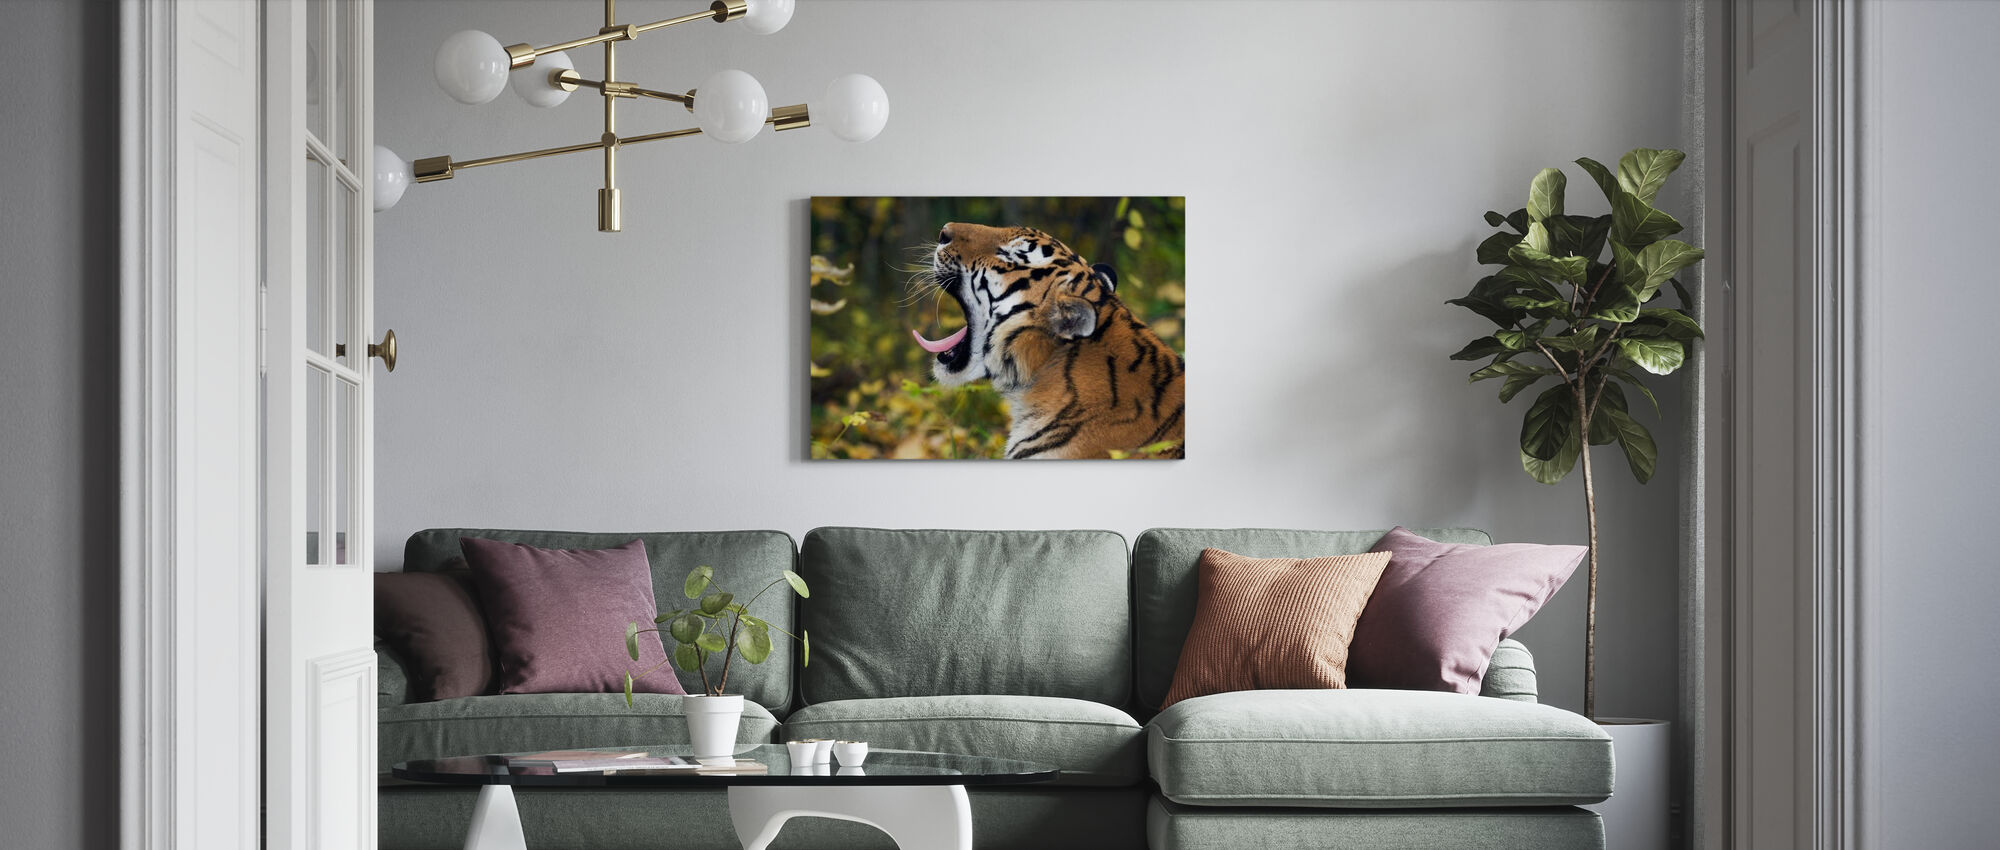 Geeuwen Siberische Tijger - Canvas print - Woonkamer